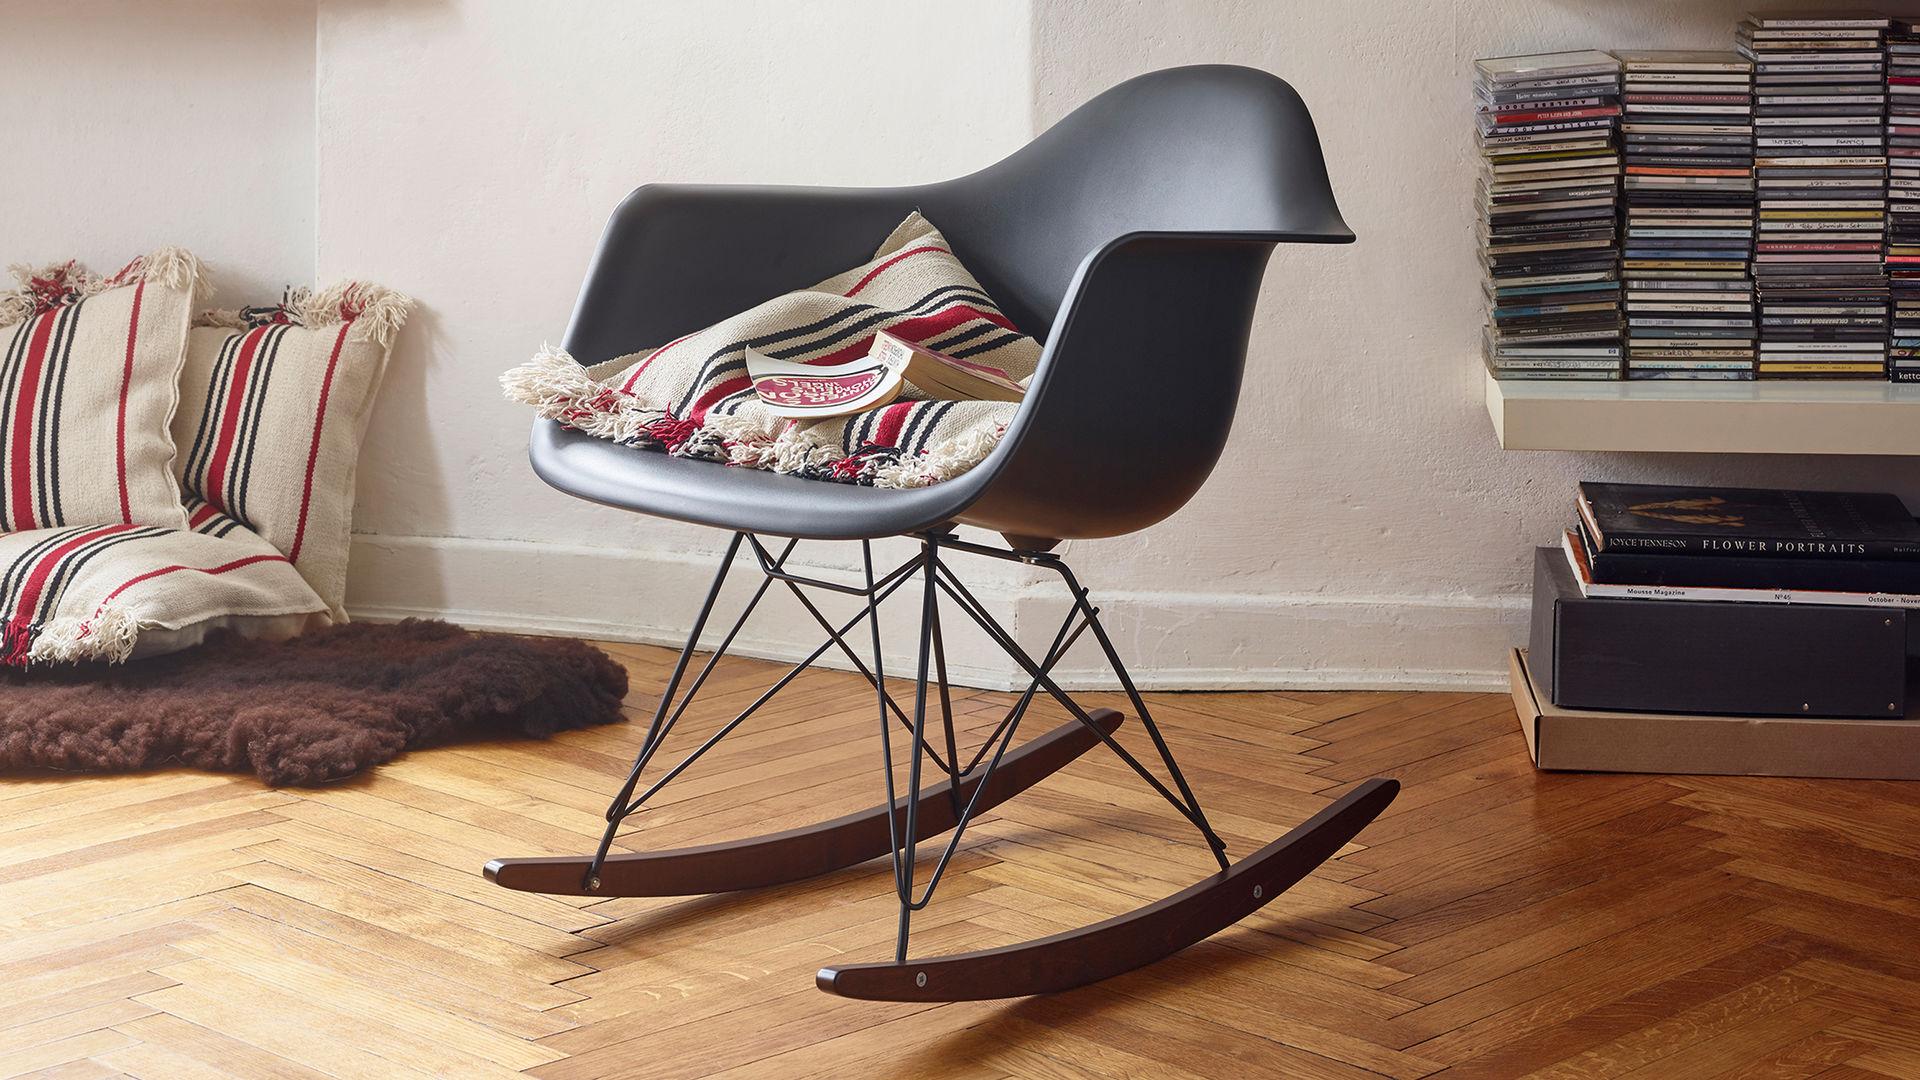 Remarkable Vitra Eames Plastic Armchair Rar Inzonedesignstudio Interior Chair Design Inzonedesignstudiocom